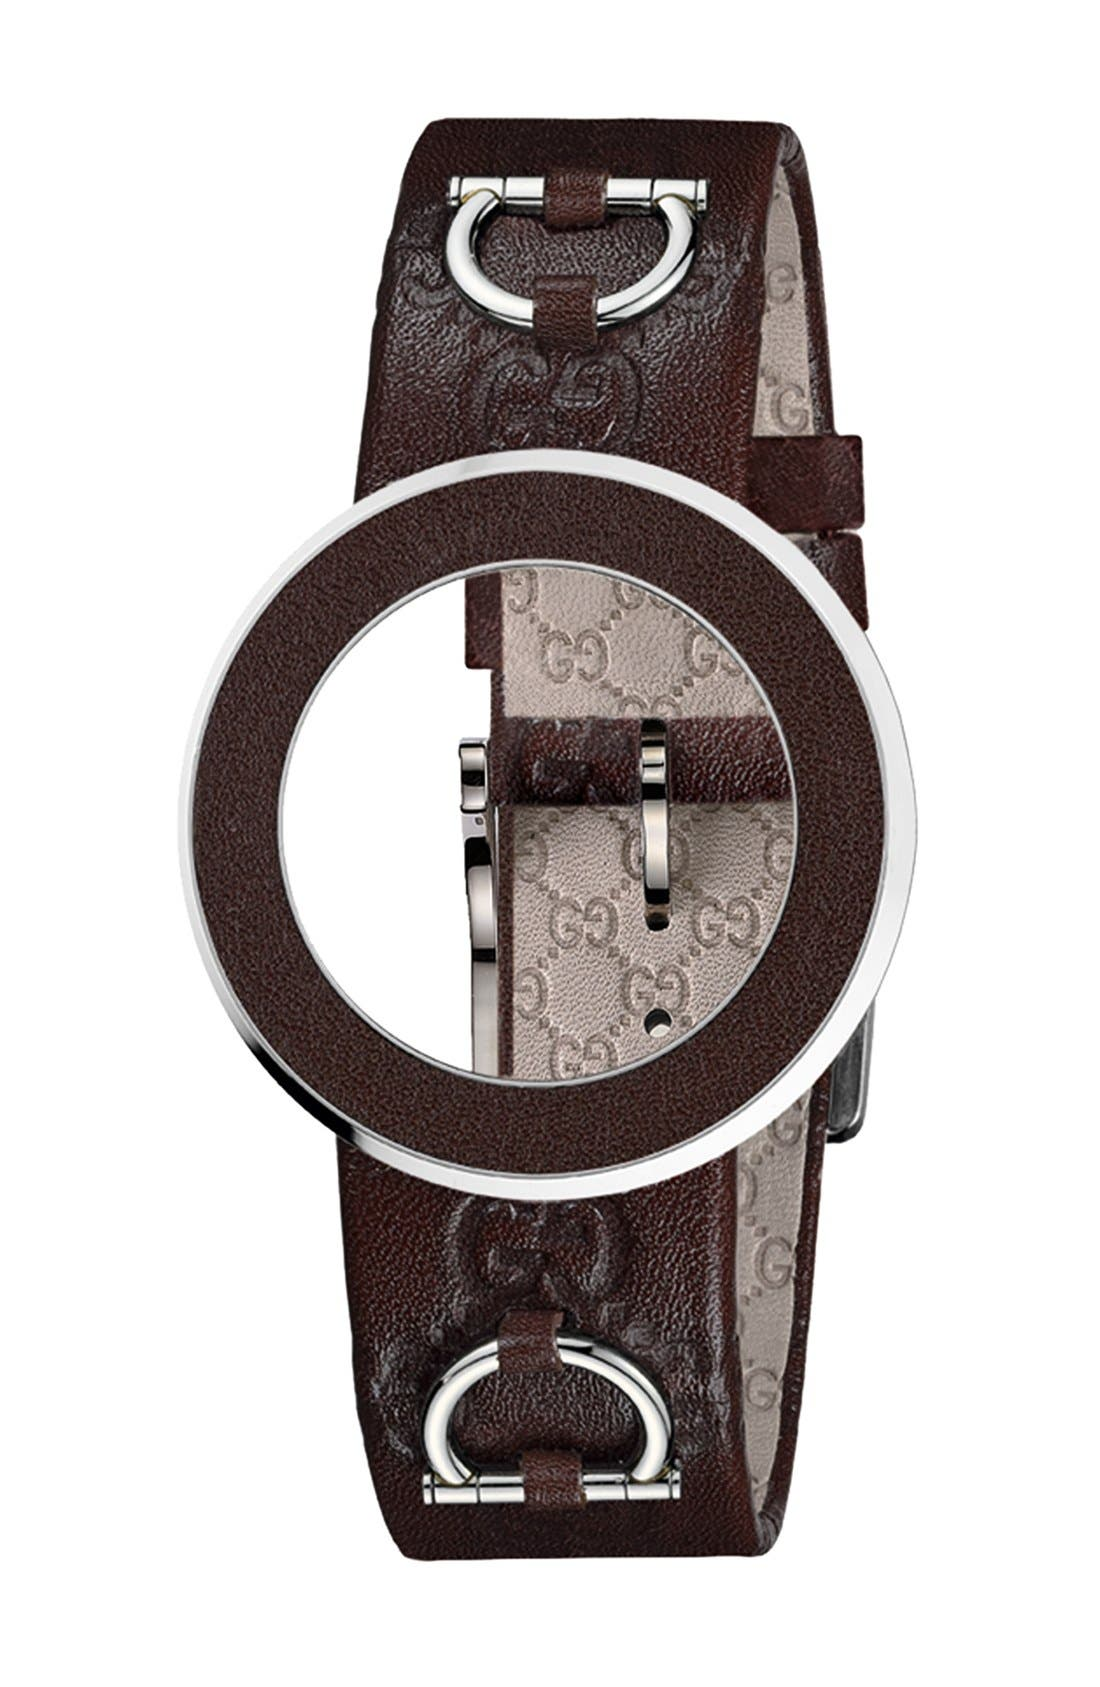 Main Image - Gucci 'U-Play' Leather Bezel & Watch Strap